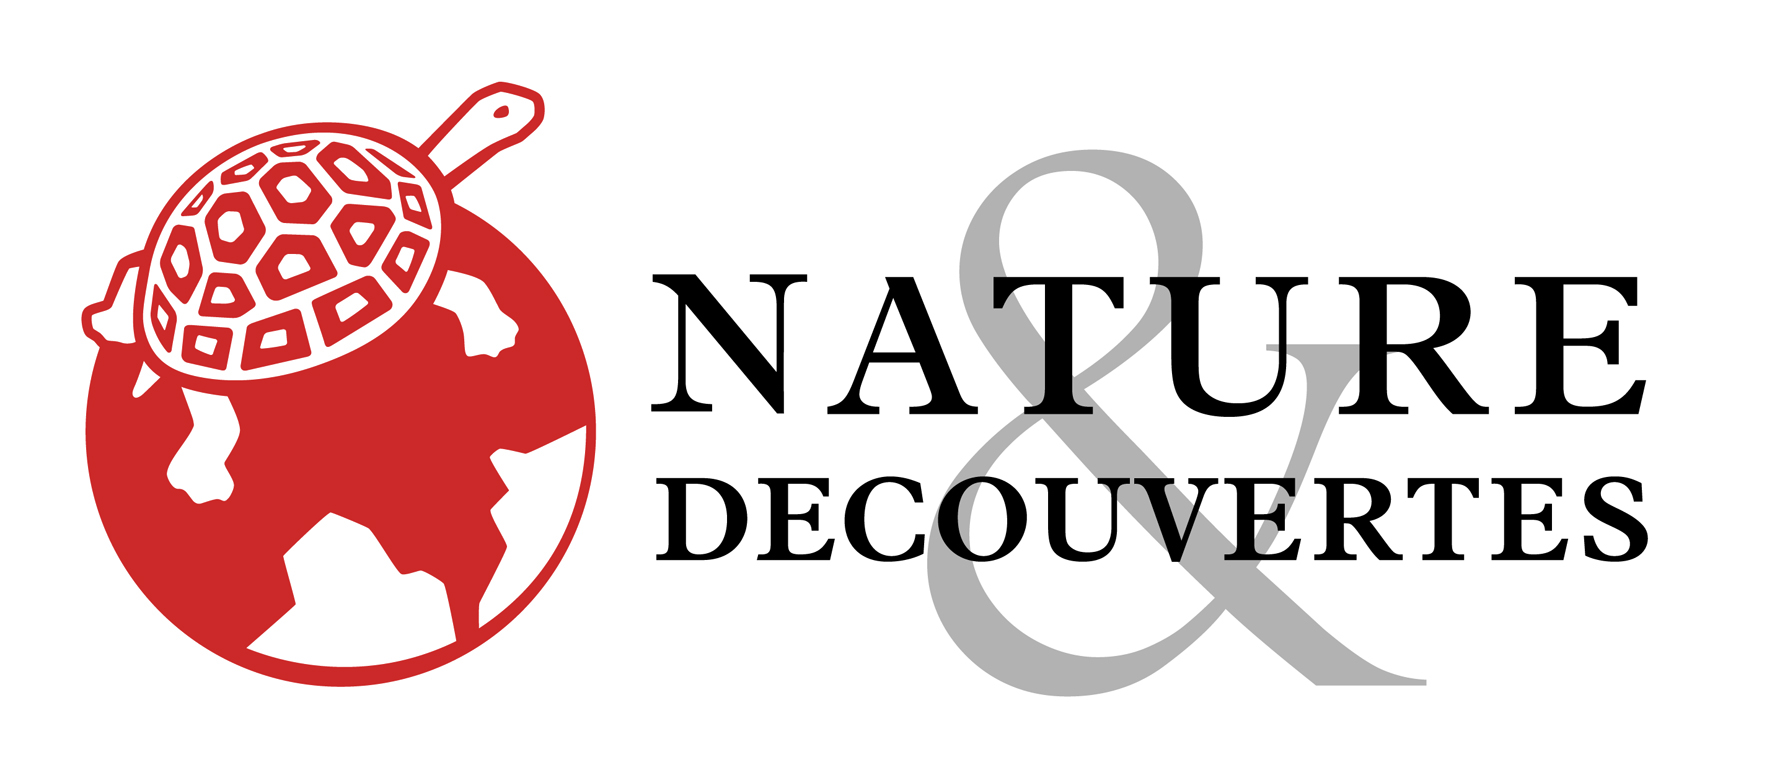 https://cdnfiles1.biolovision.net/www.gobg.ch/userfiles/Torcol/logo-NetD-2013-H-quadri.jpg